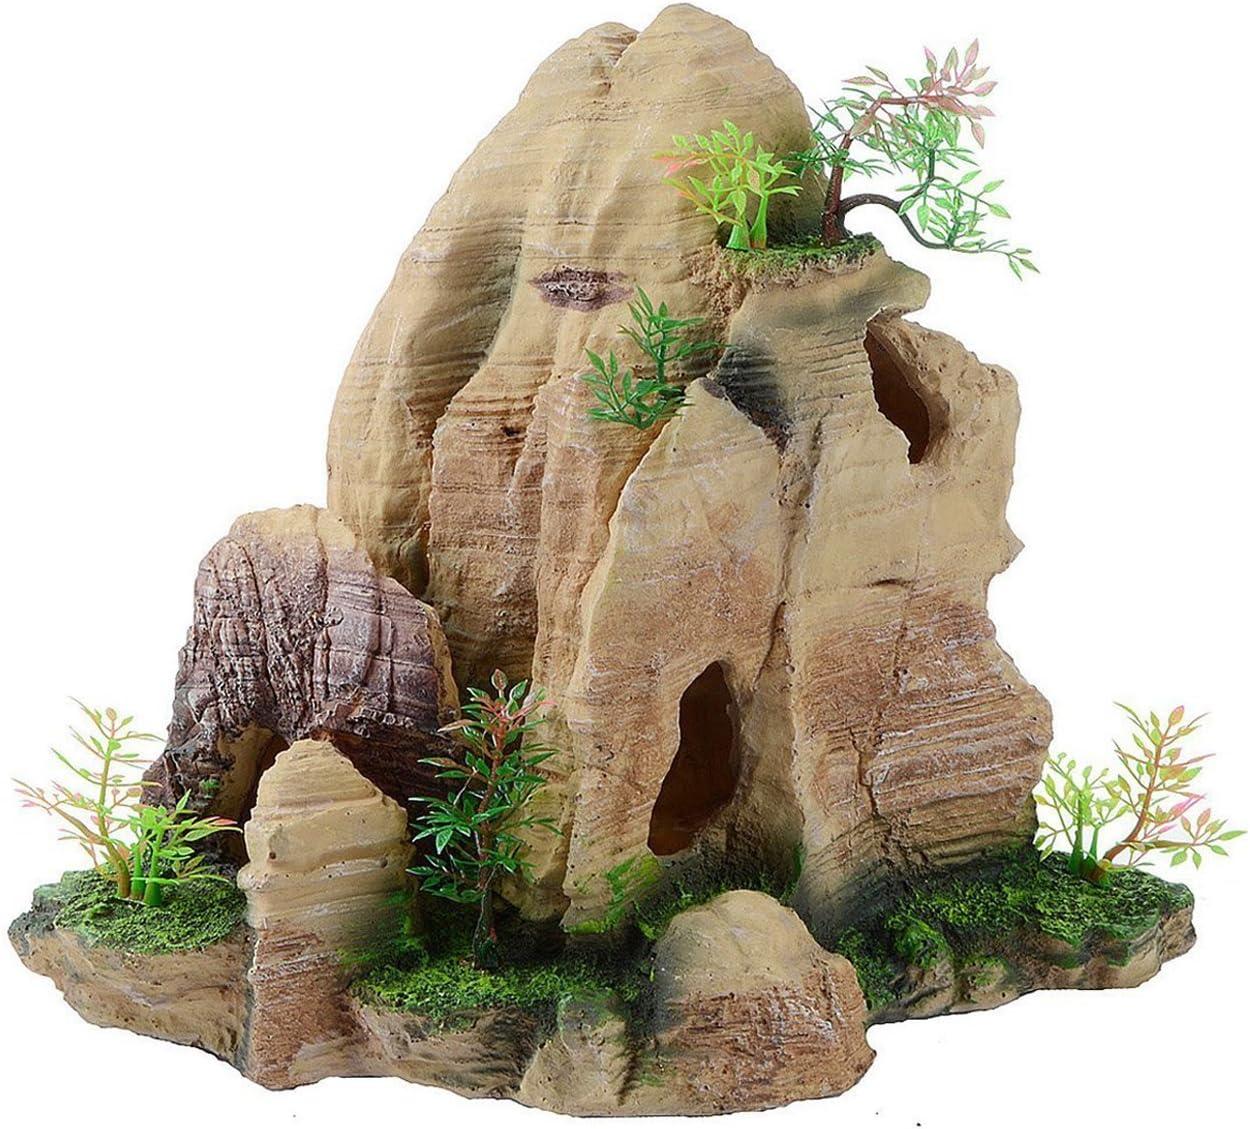 Saim Mountain View Aquarium Decor Stone Rockery Hiding Cave Tree Fish Tank Ornament